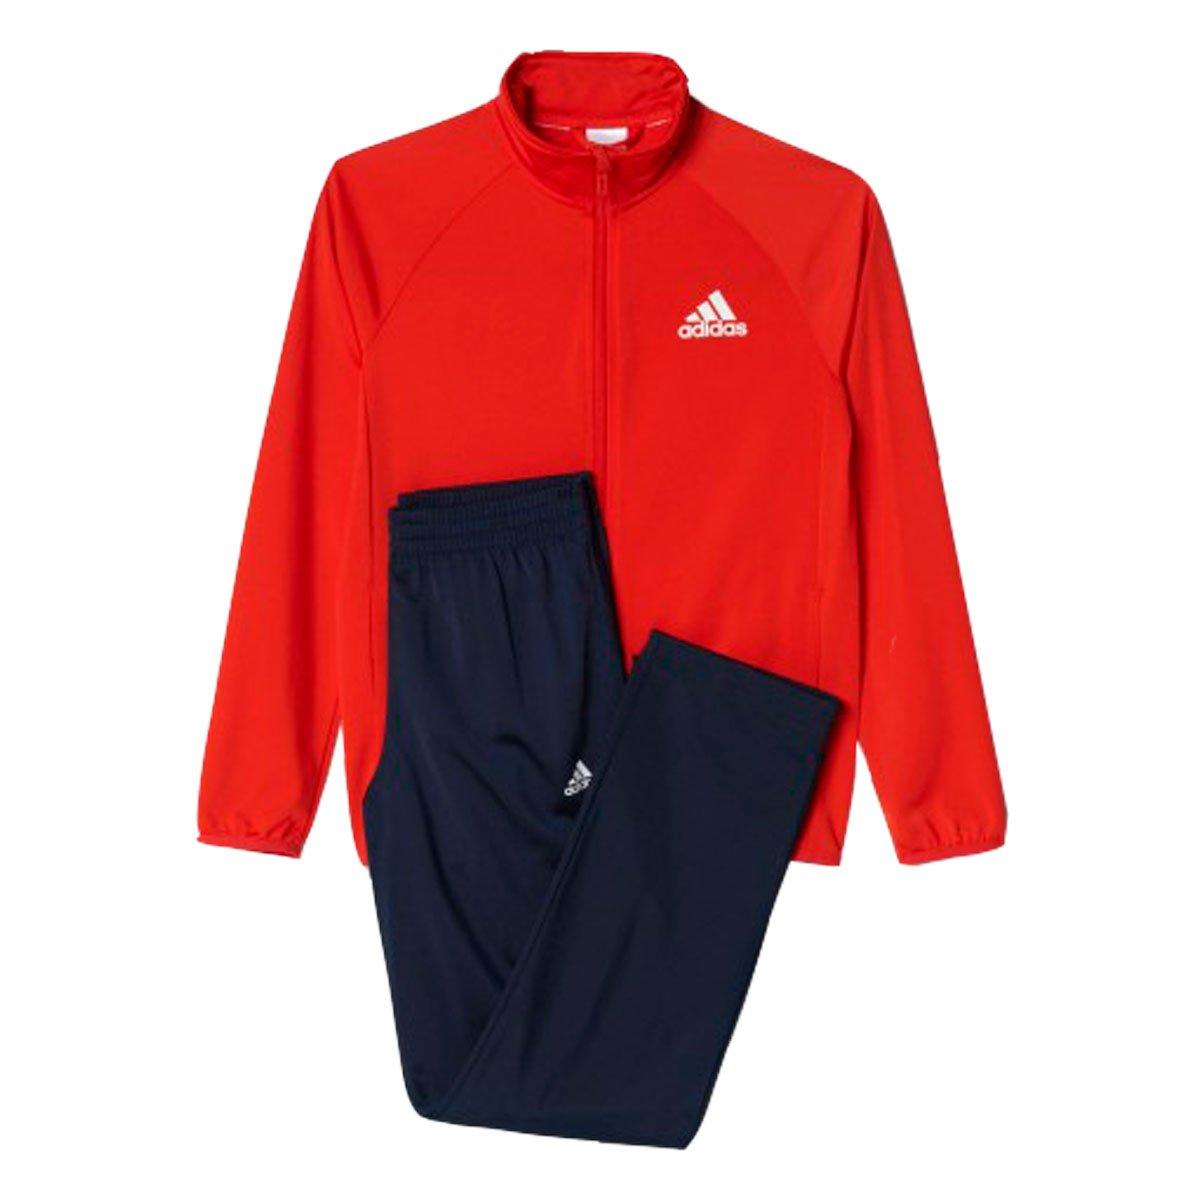 9e568150ecf Bizz Store - Agasalho Infantil Menino Adidas YB TS Entry Open Hem